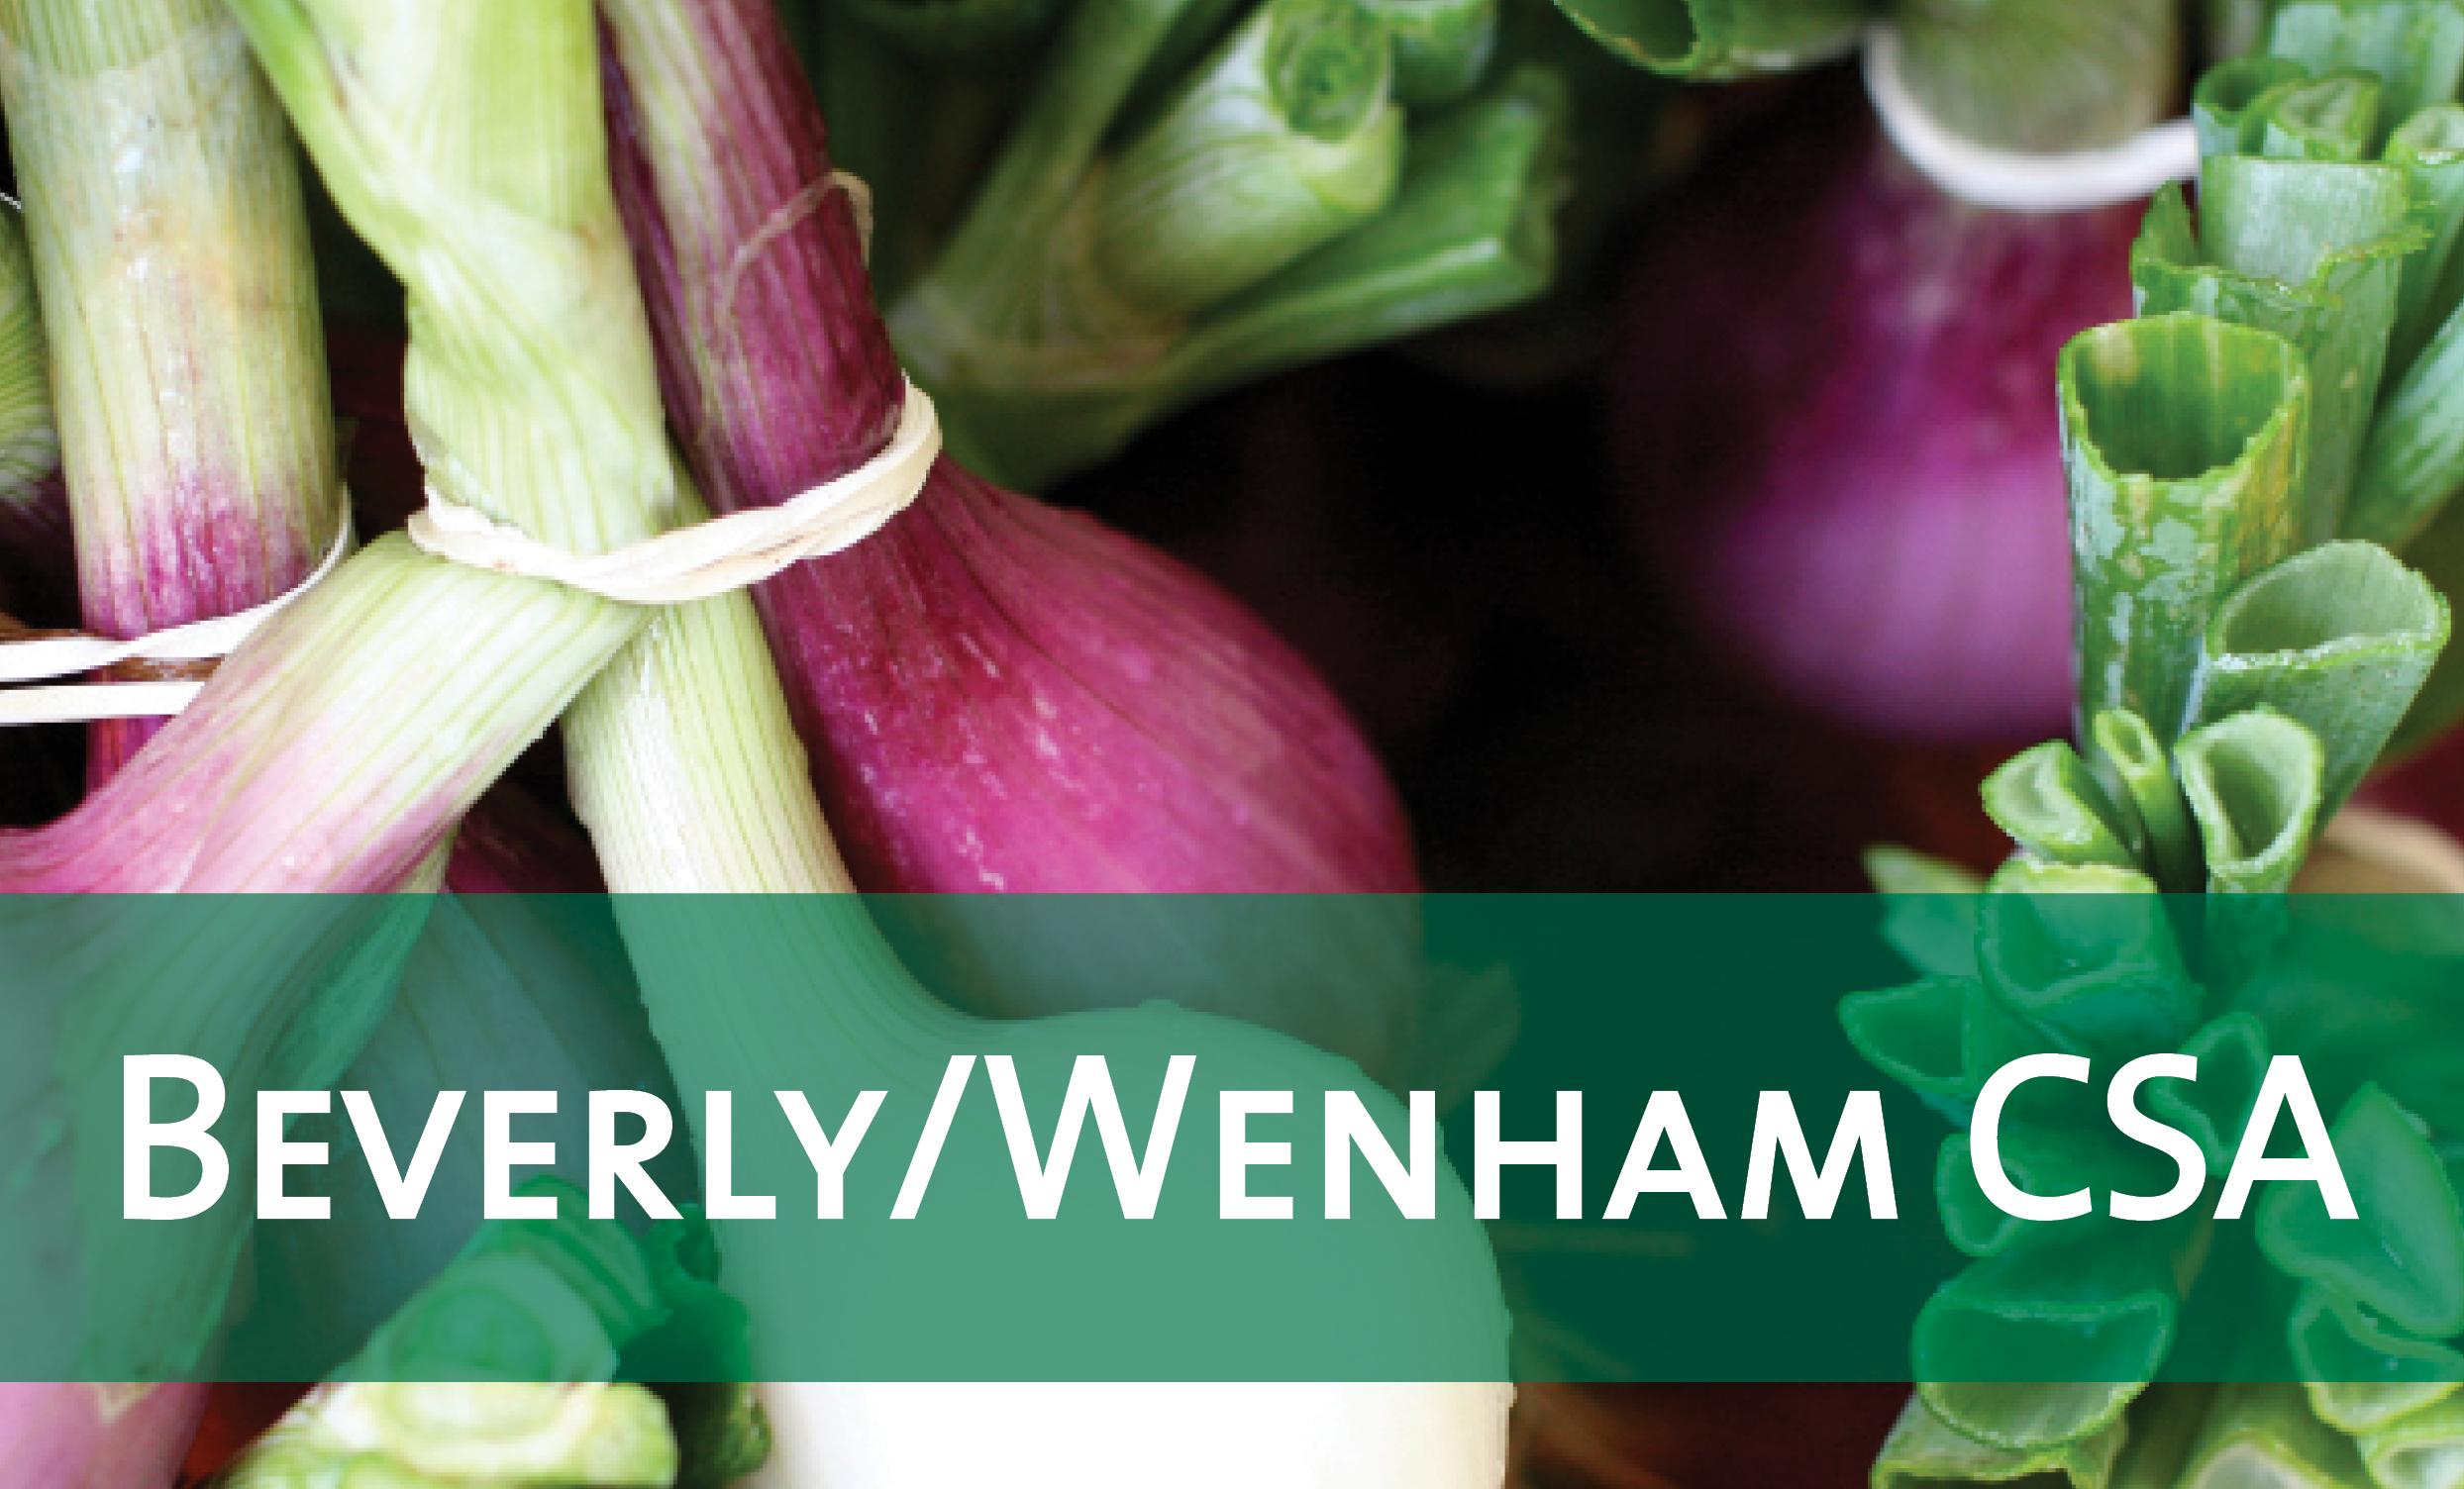 Beverly/Wenham On-Farm CSA